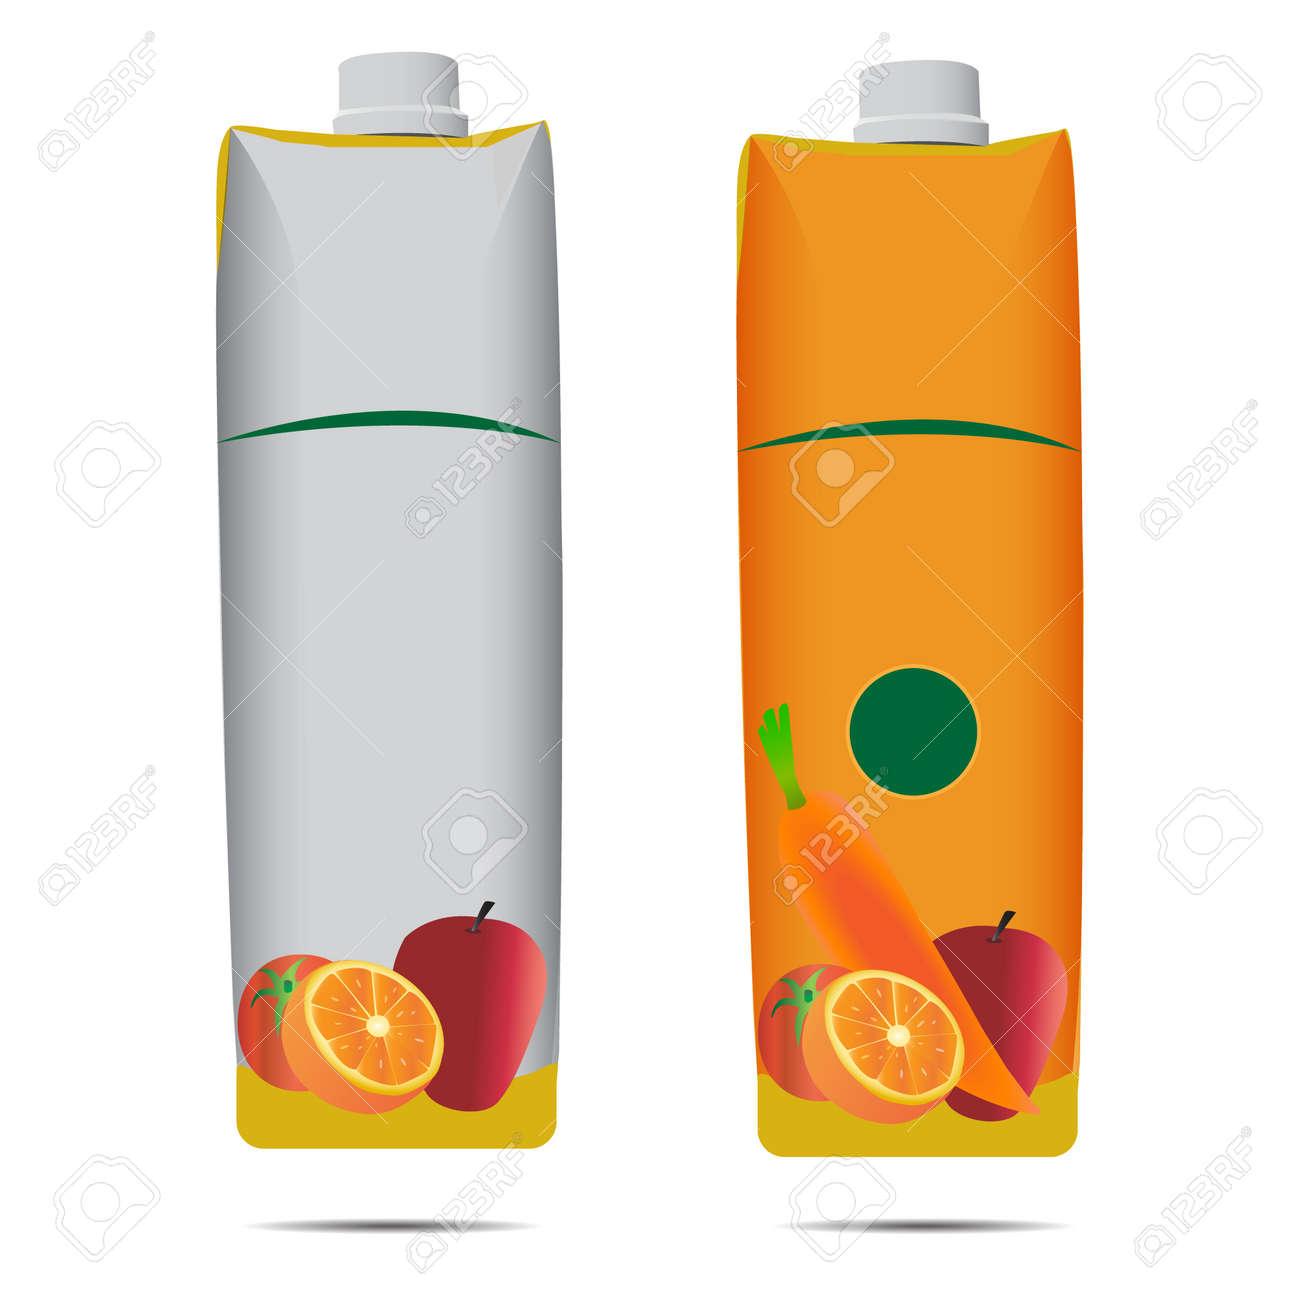 juice box carton template vector illustration royalty free cliparts